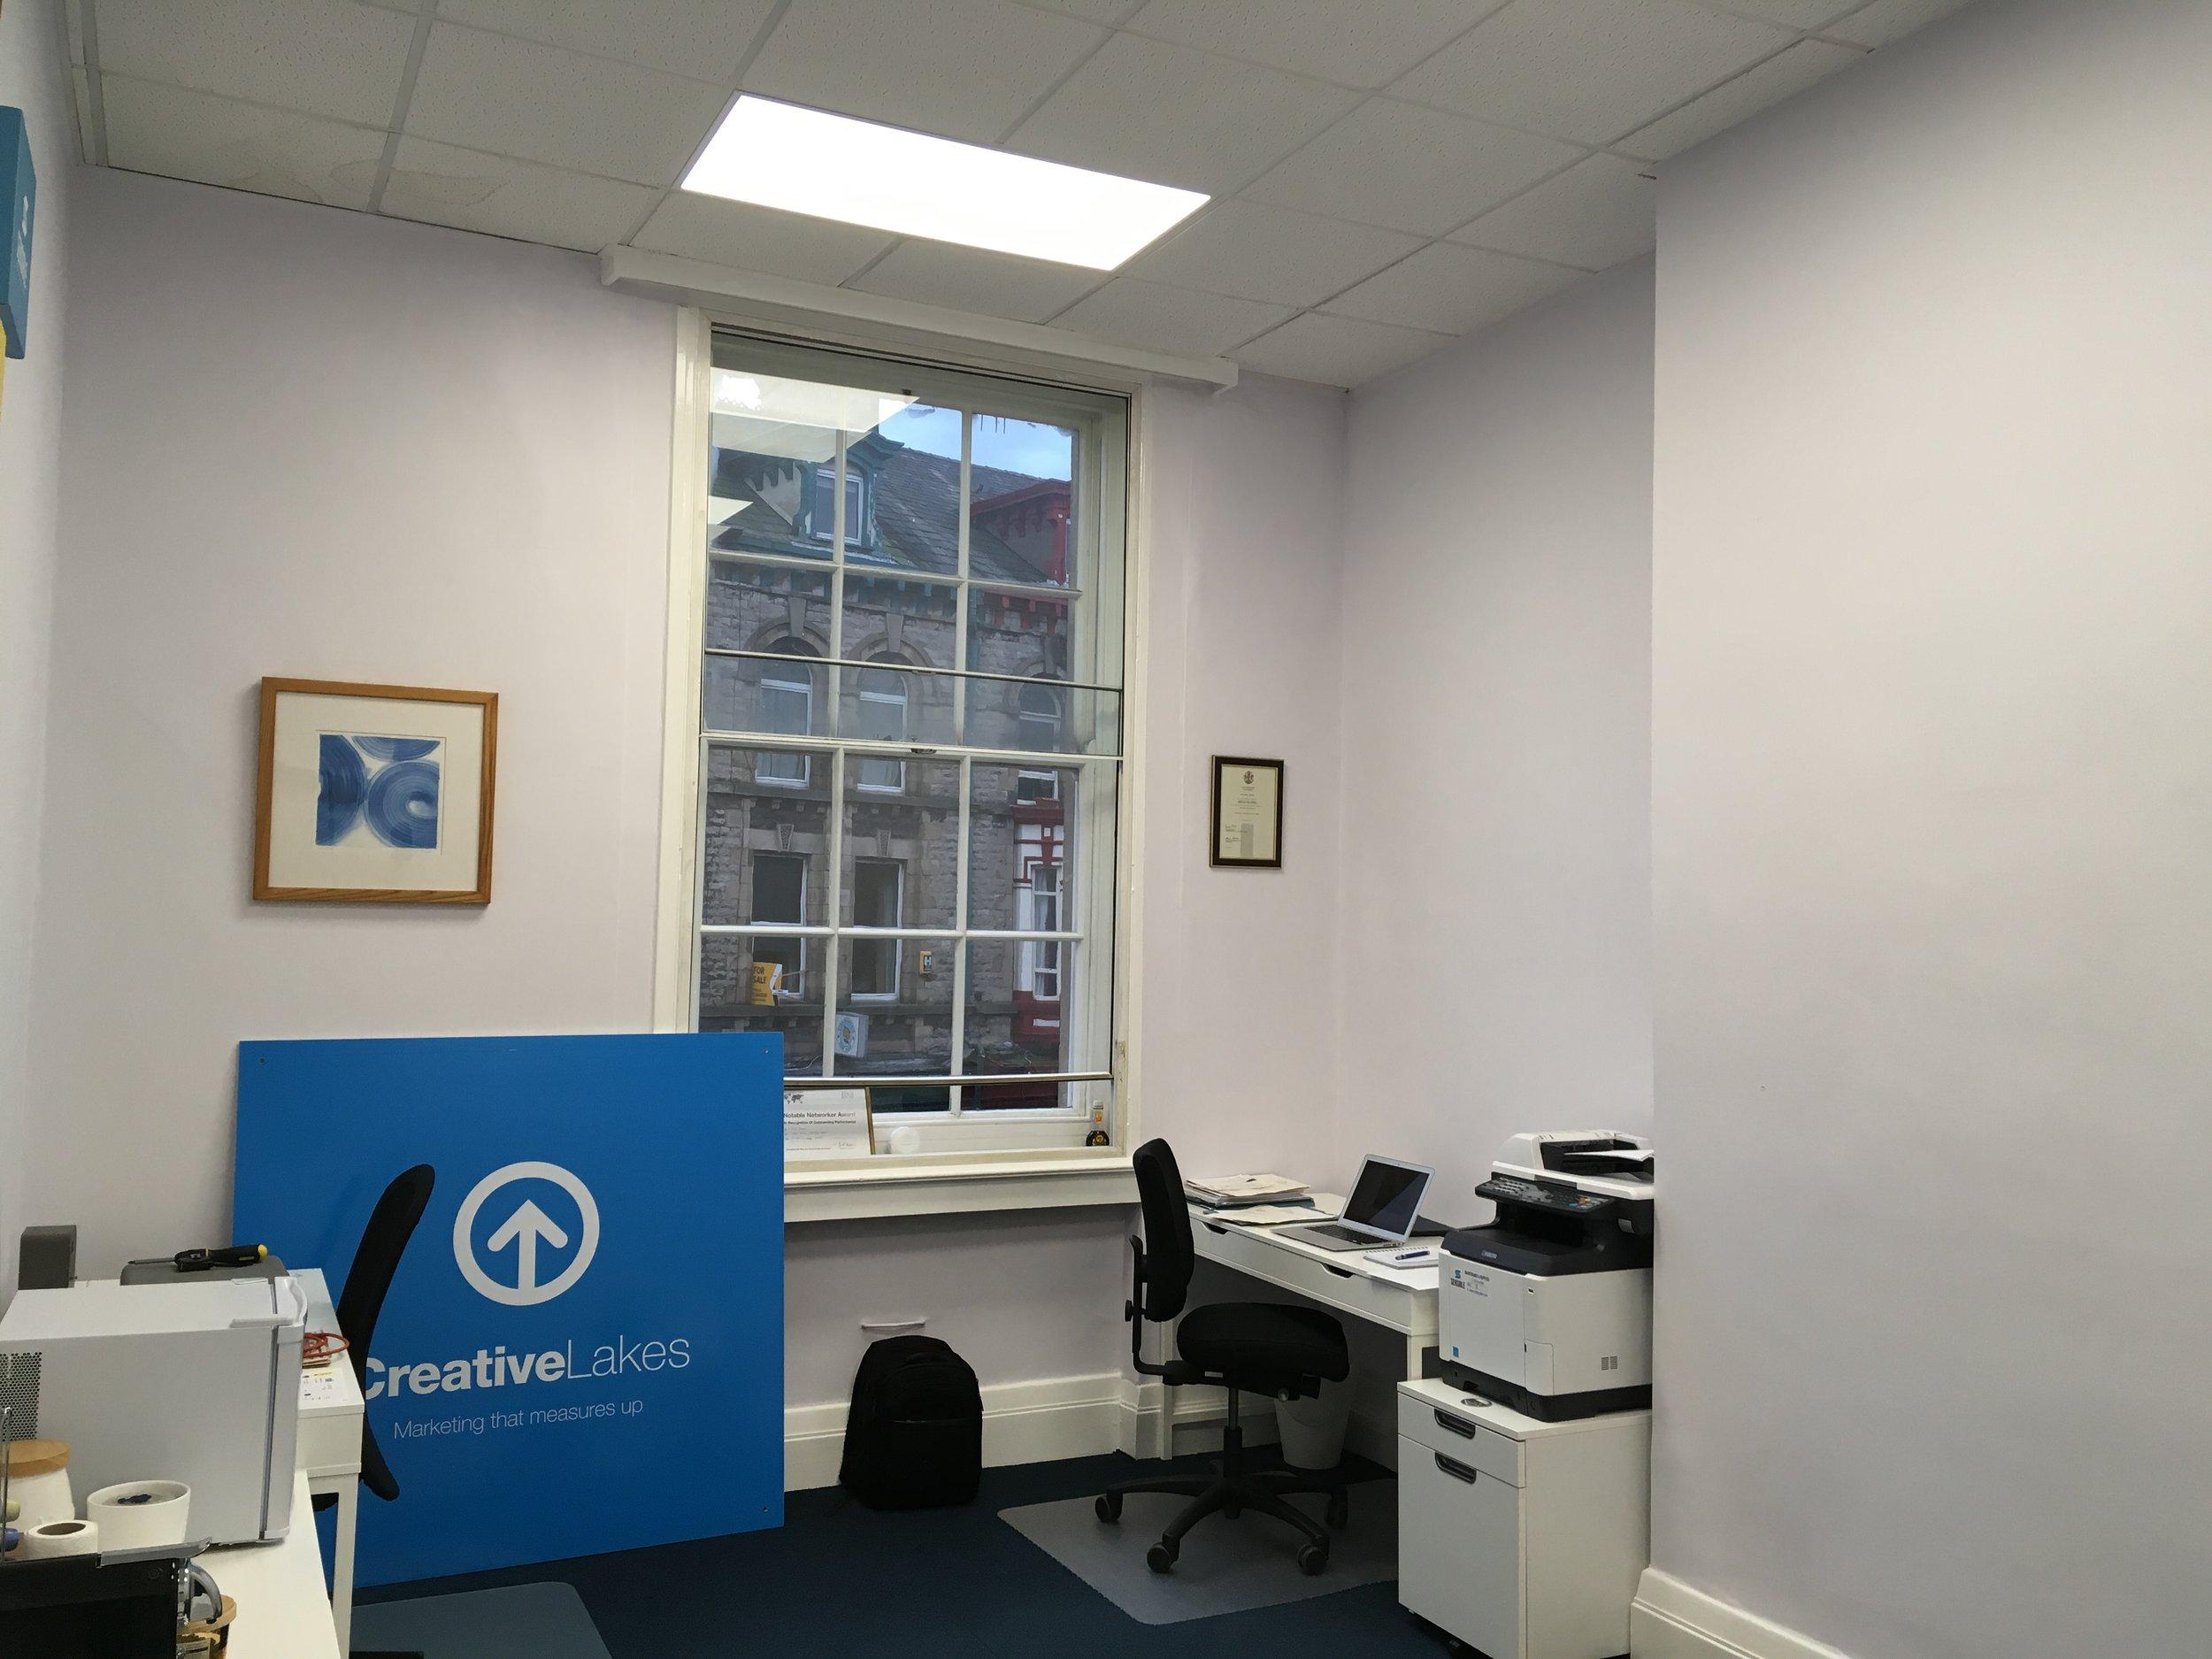 New Creative Lakes office photo.JPG